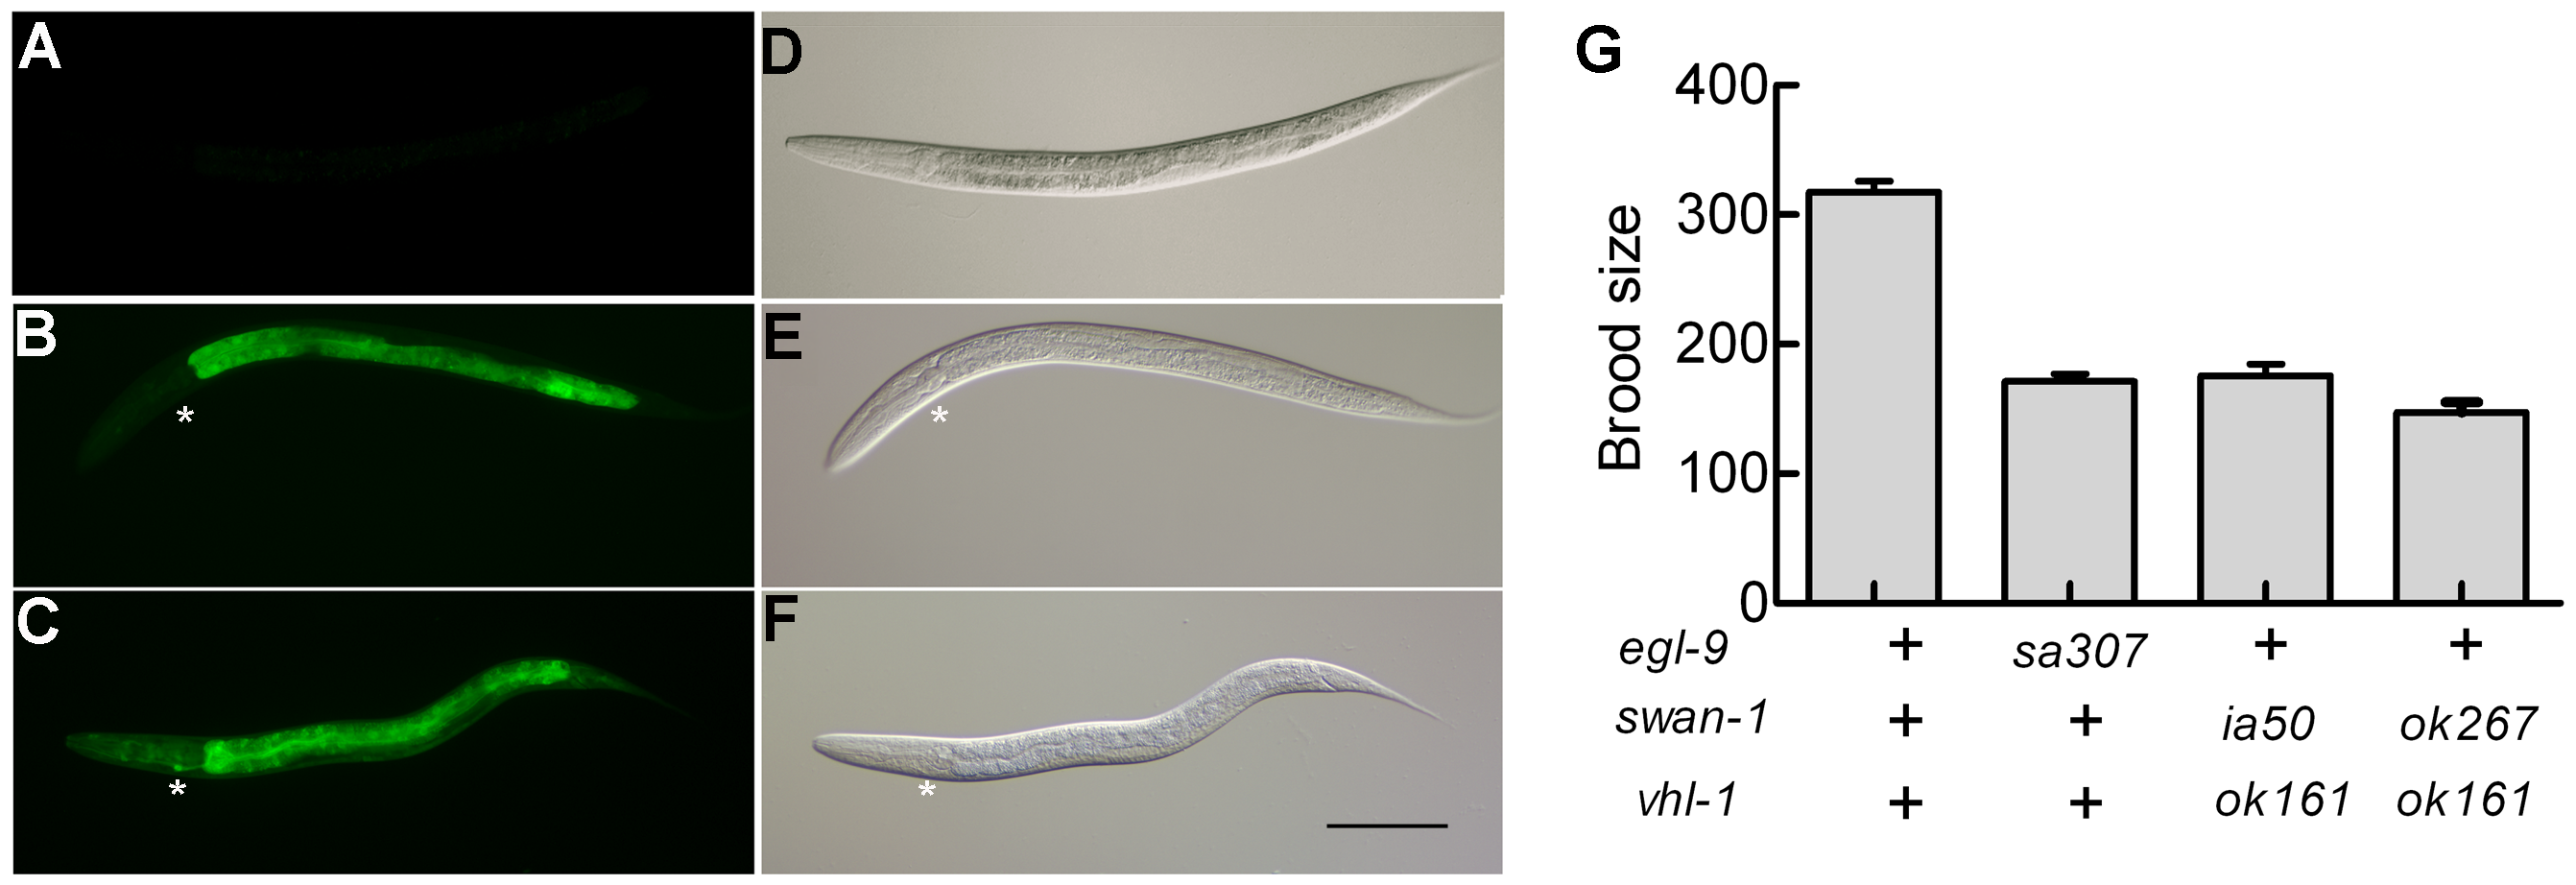 Phenotypic characterization of the <i>ia50</i> mutation.